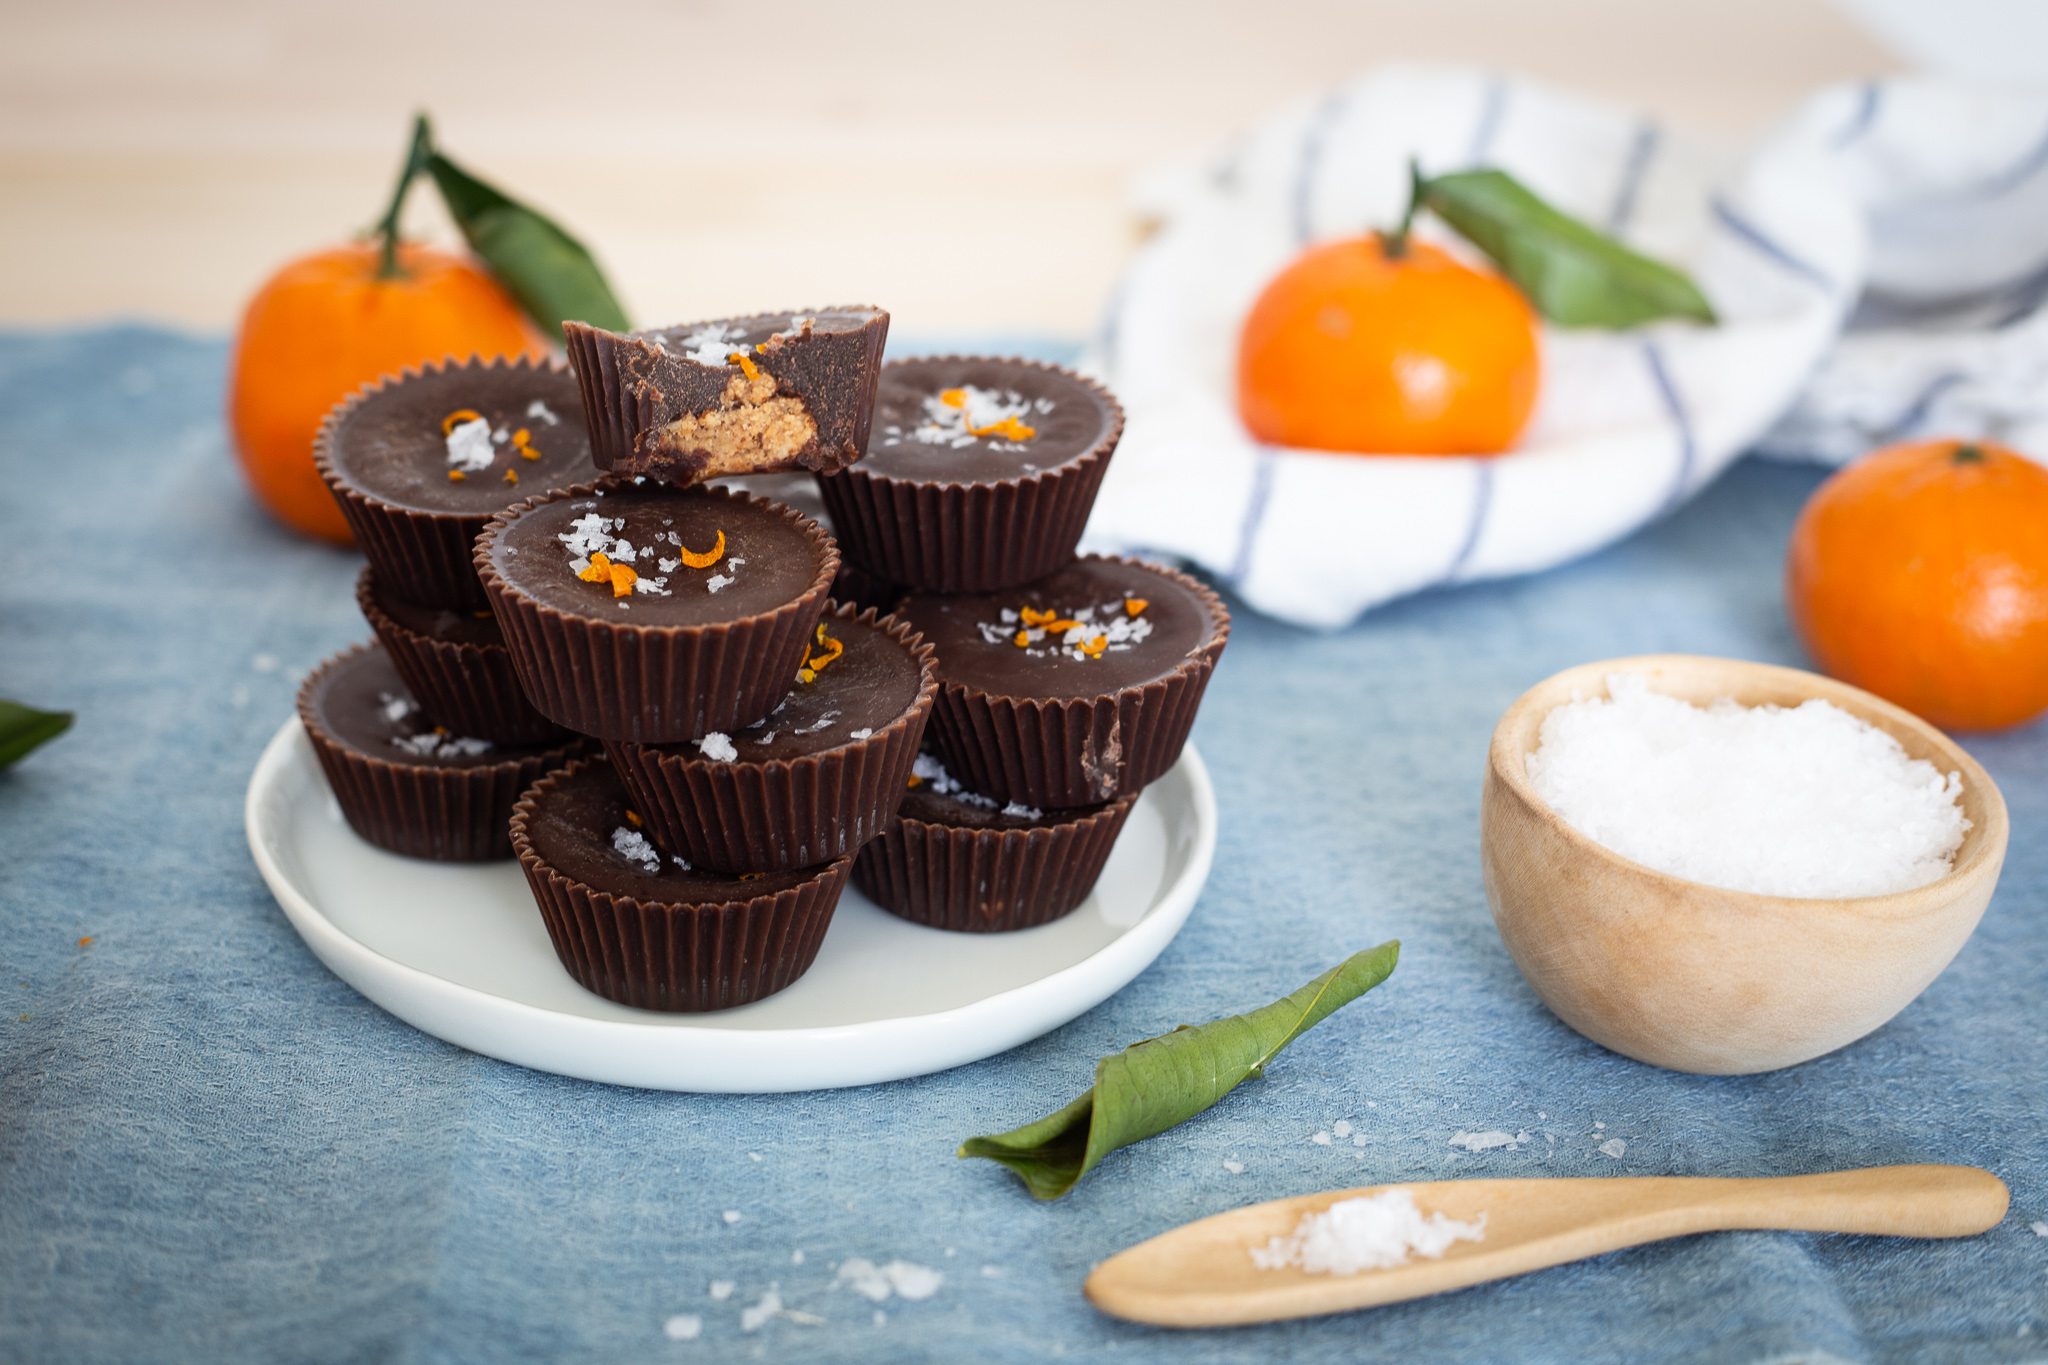 Vegan Paleo Orange Chocolate Nut Butter Cups